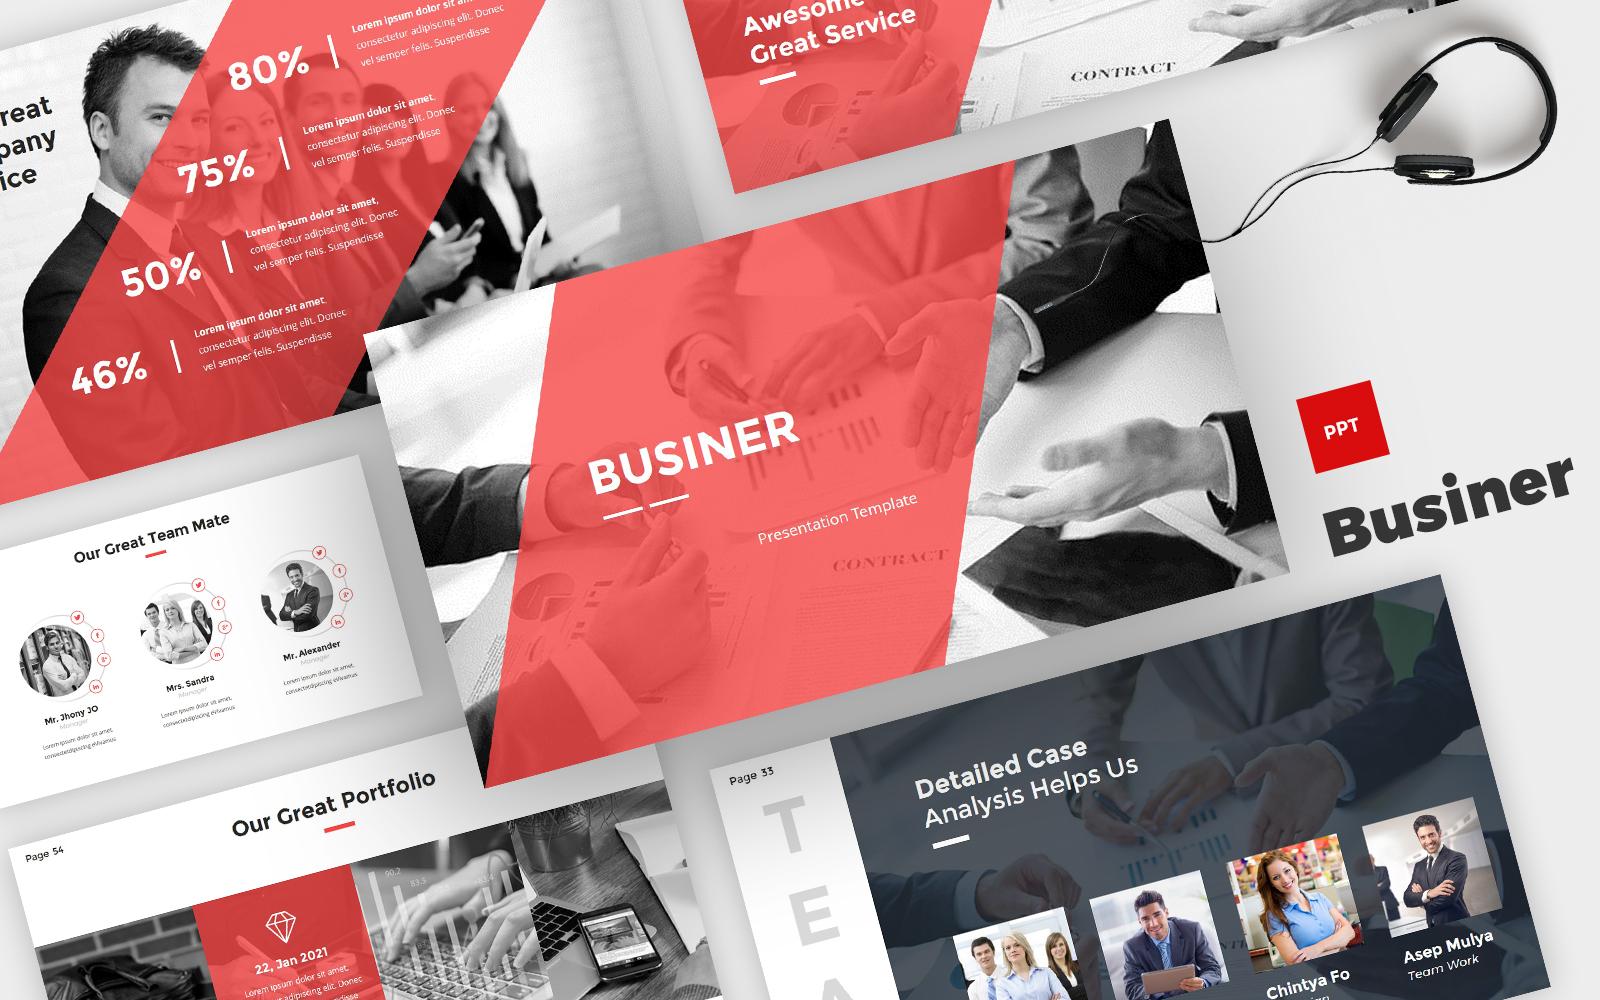 Businer - Business PowerPoint